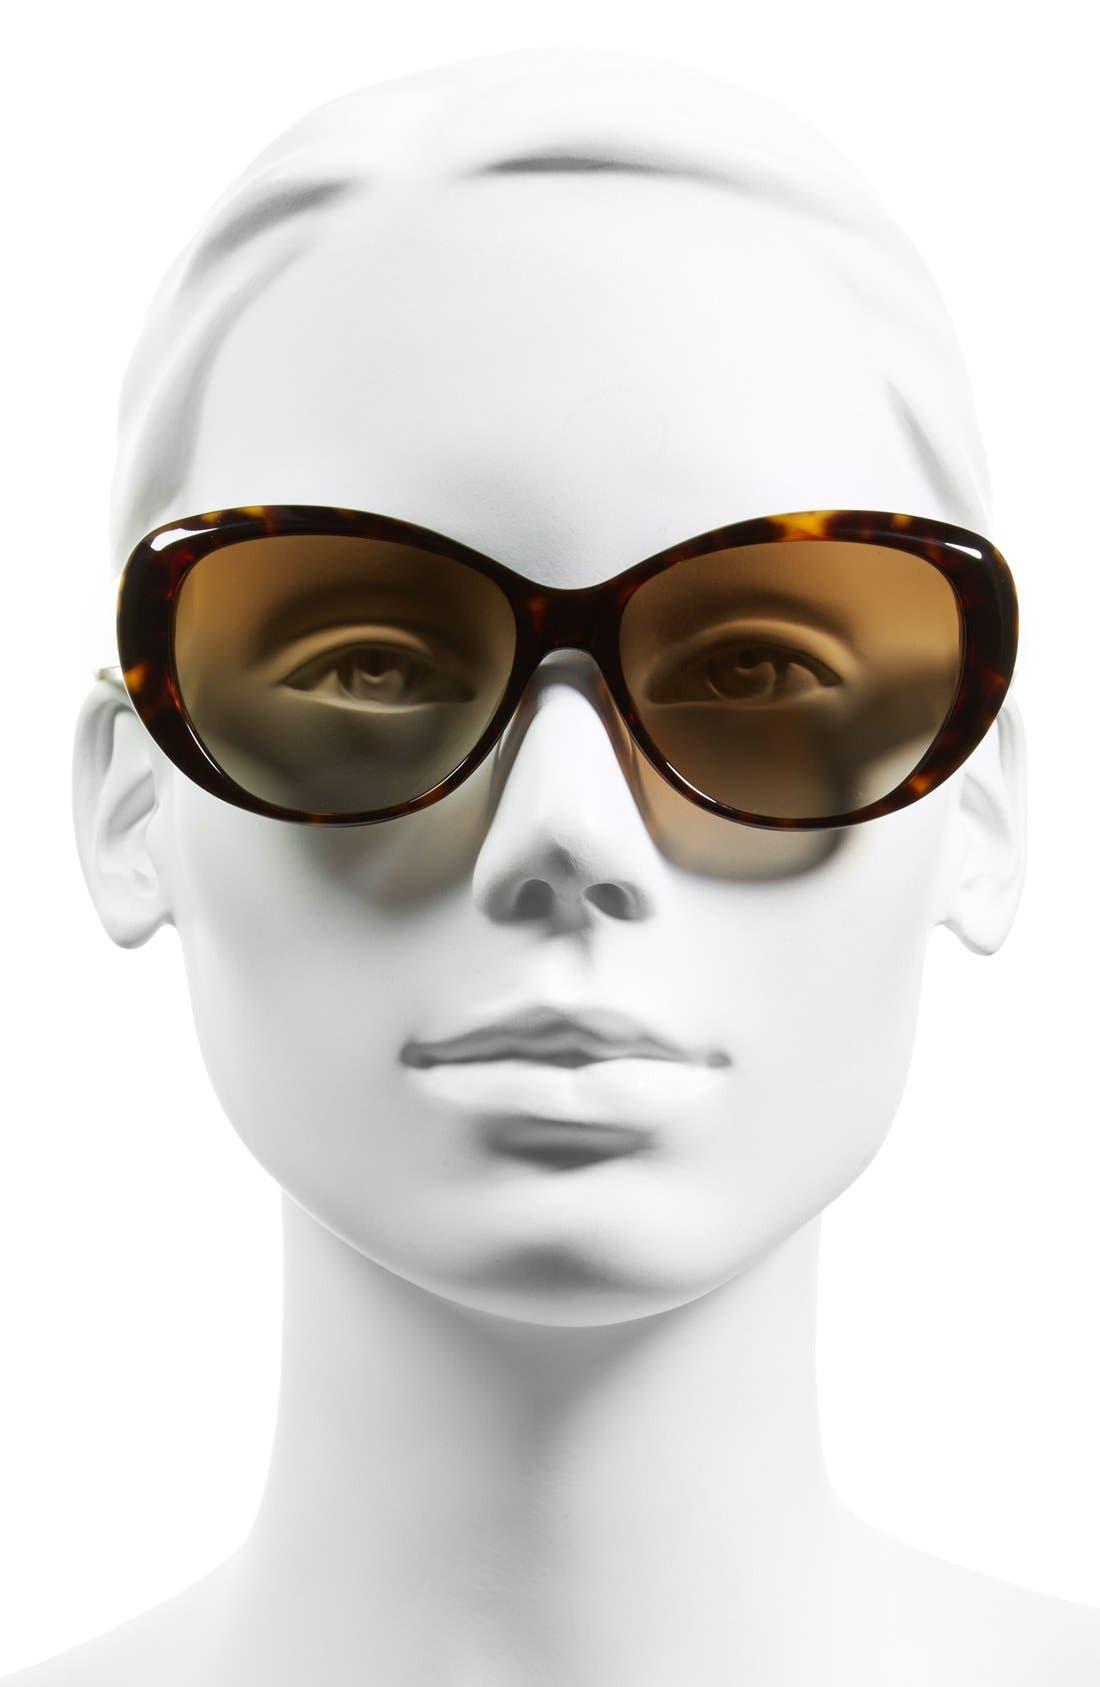 56mm Polarized Cat Eye Sunglasses,                             Alternate thumbnail 2, color,                             200